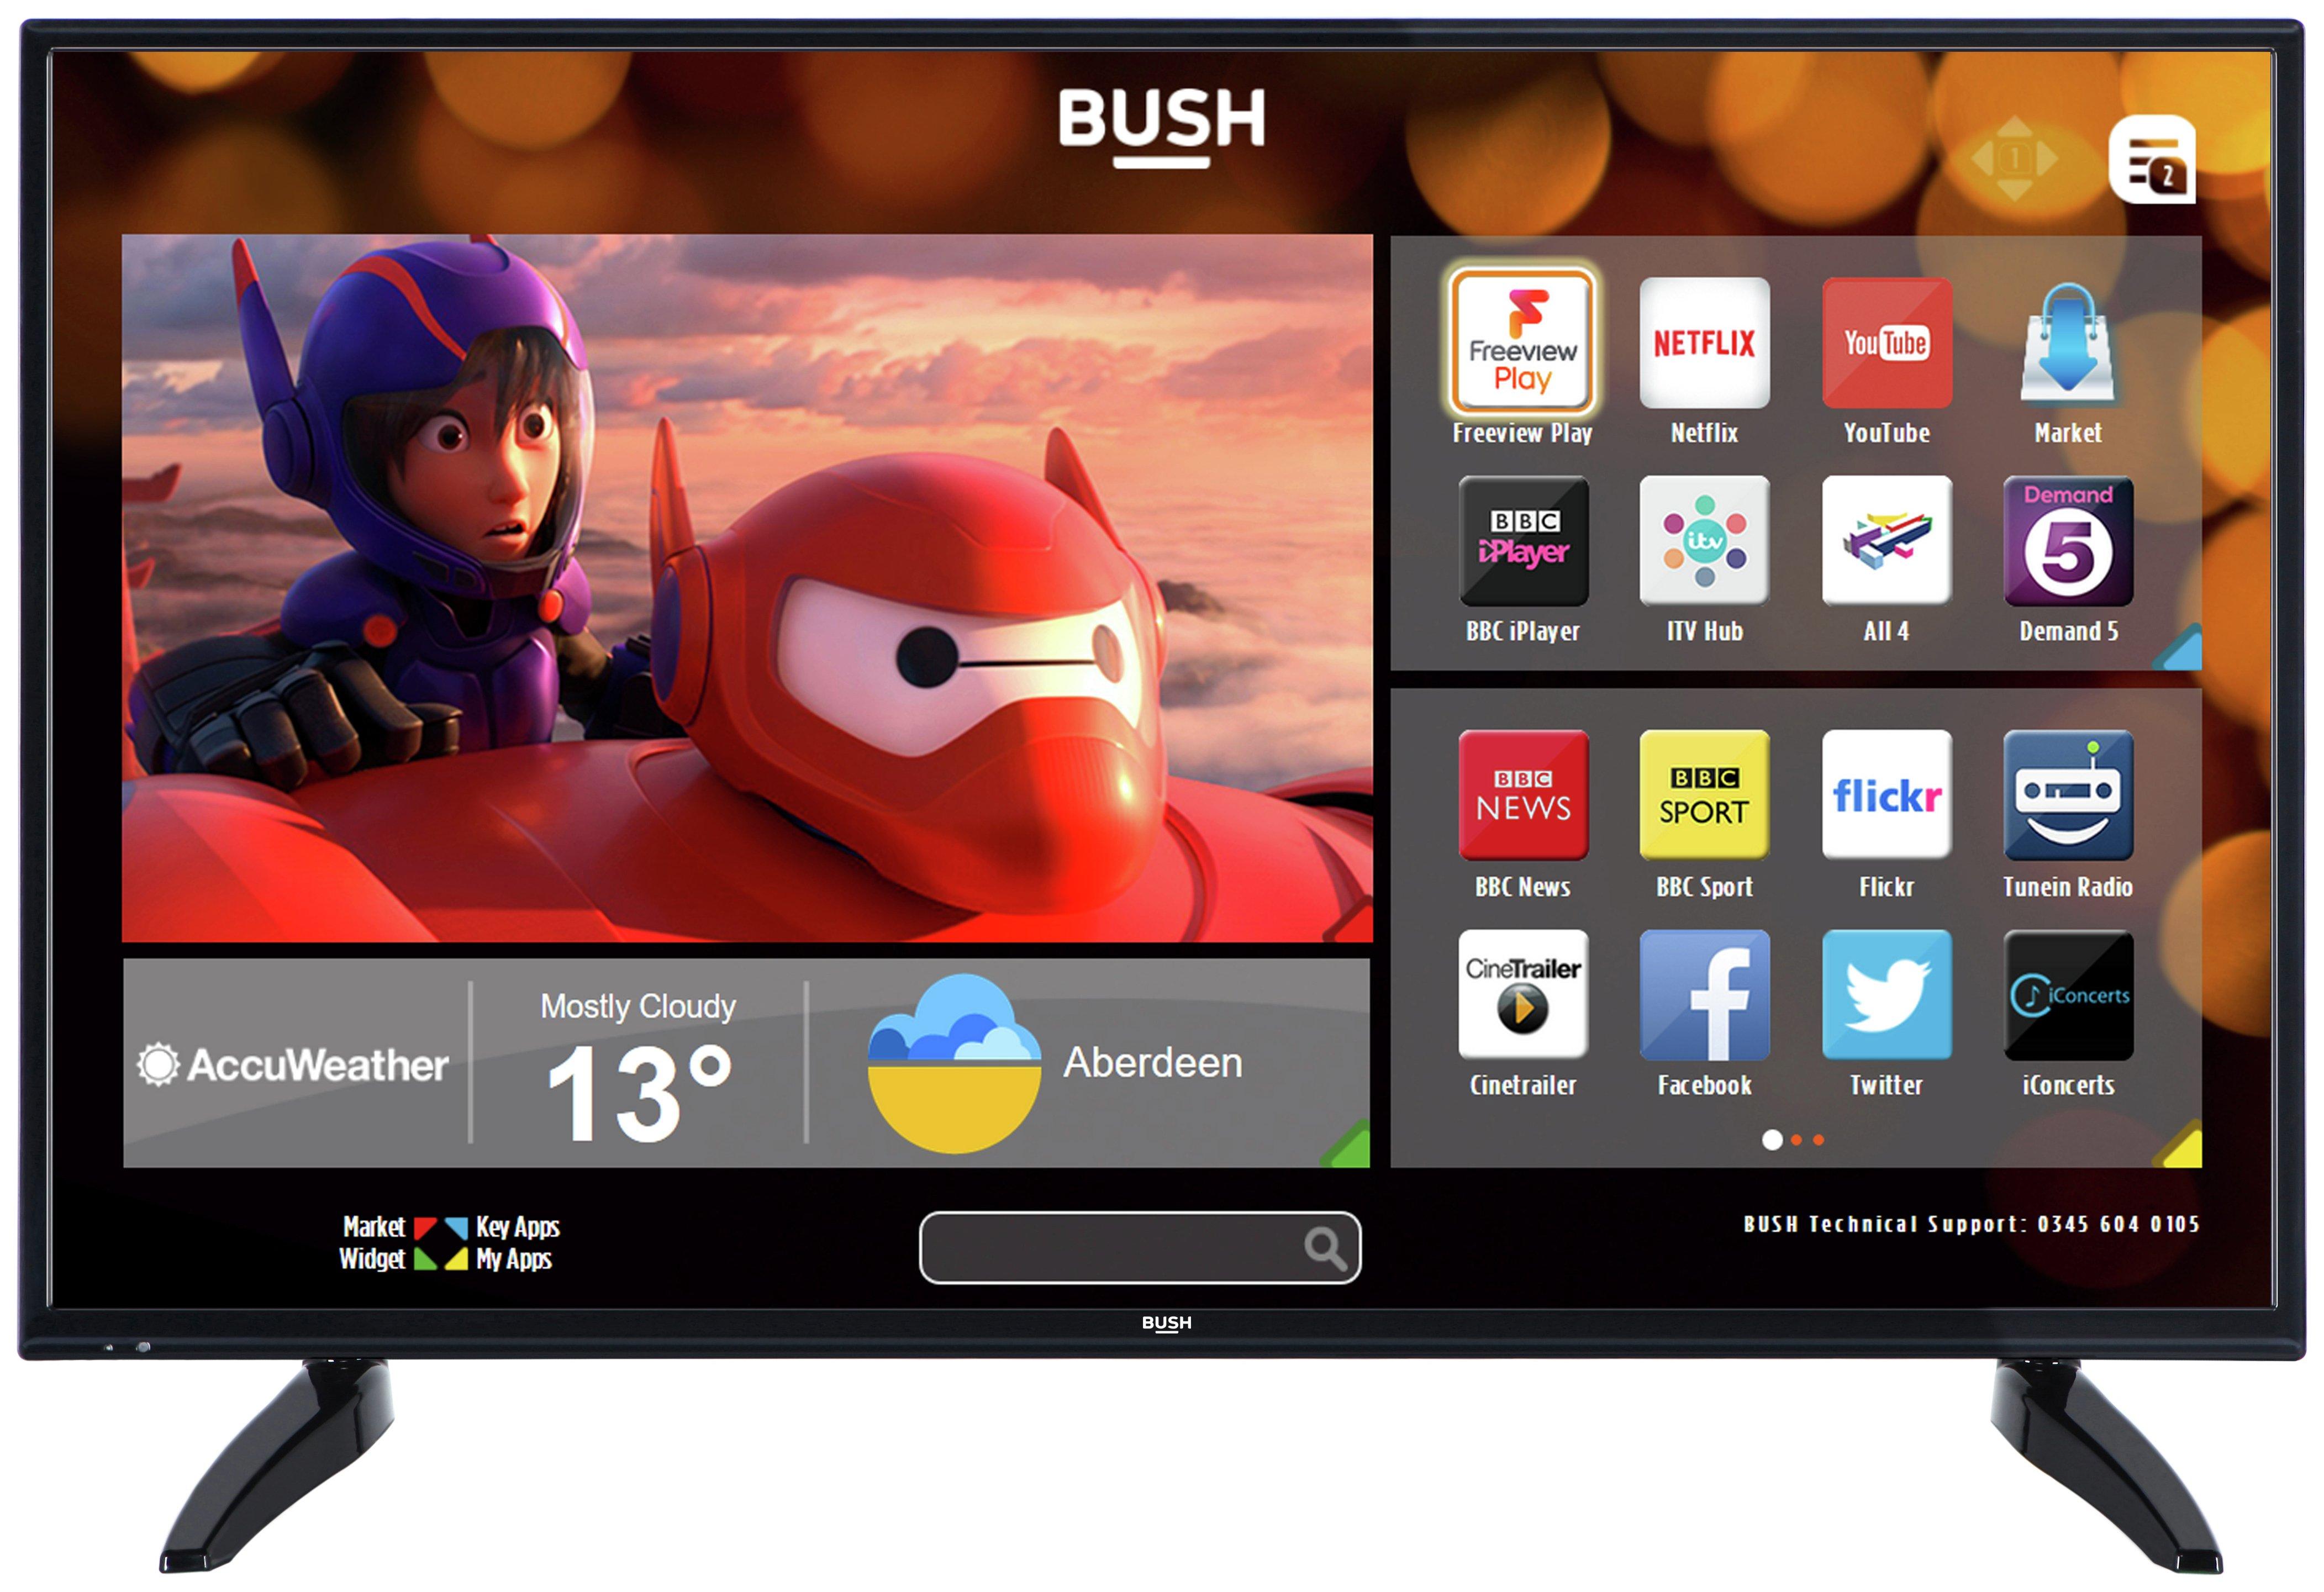 Bush LED40287 40 Inch Full HD DLED Smart TV. - Black